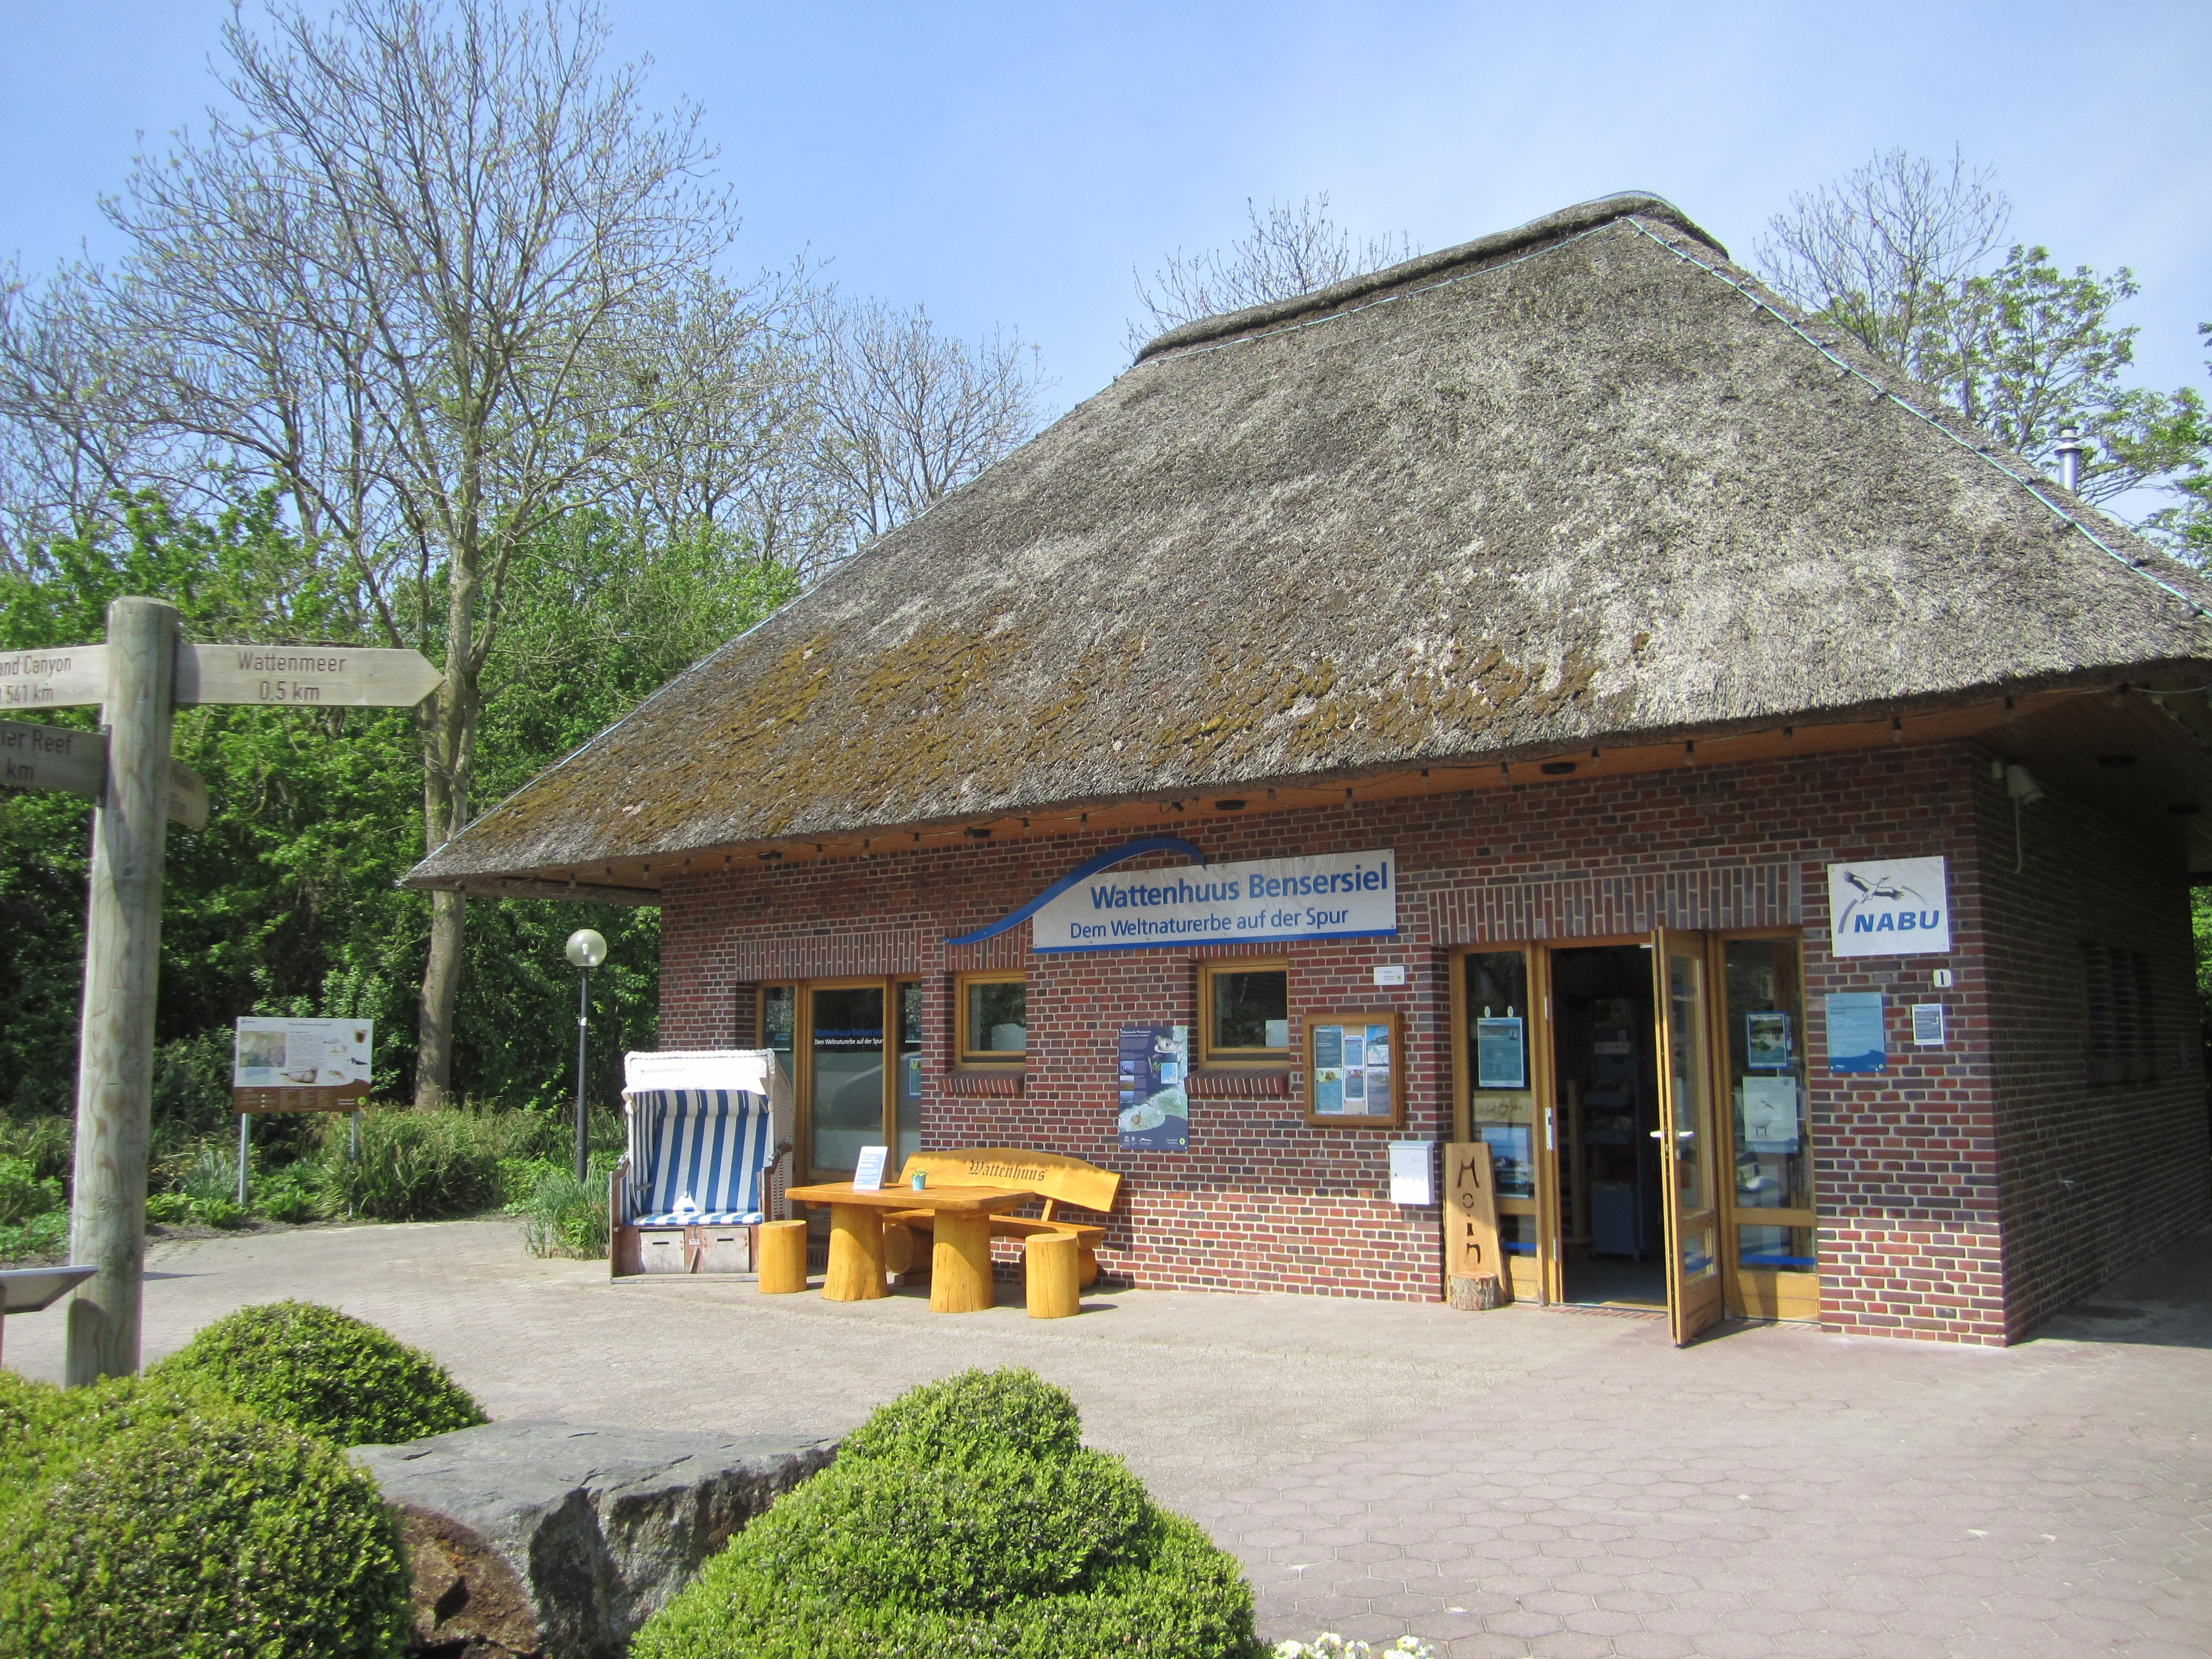 Nationalpark Informationsstelle Wattenhuus Bensersiel